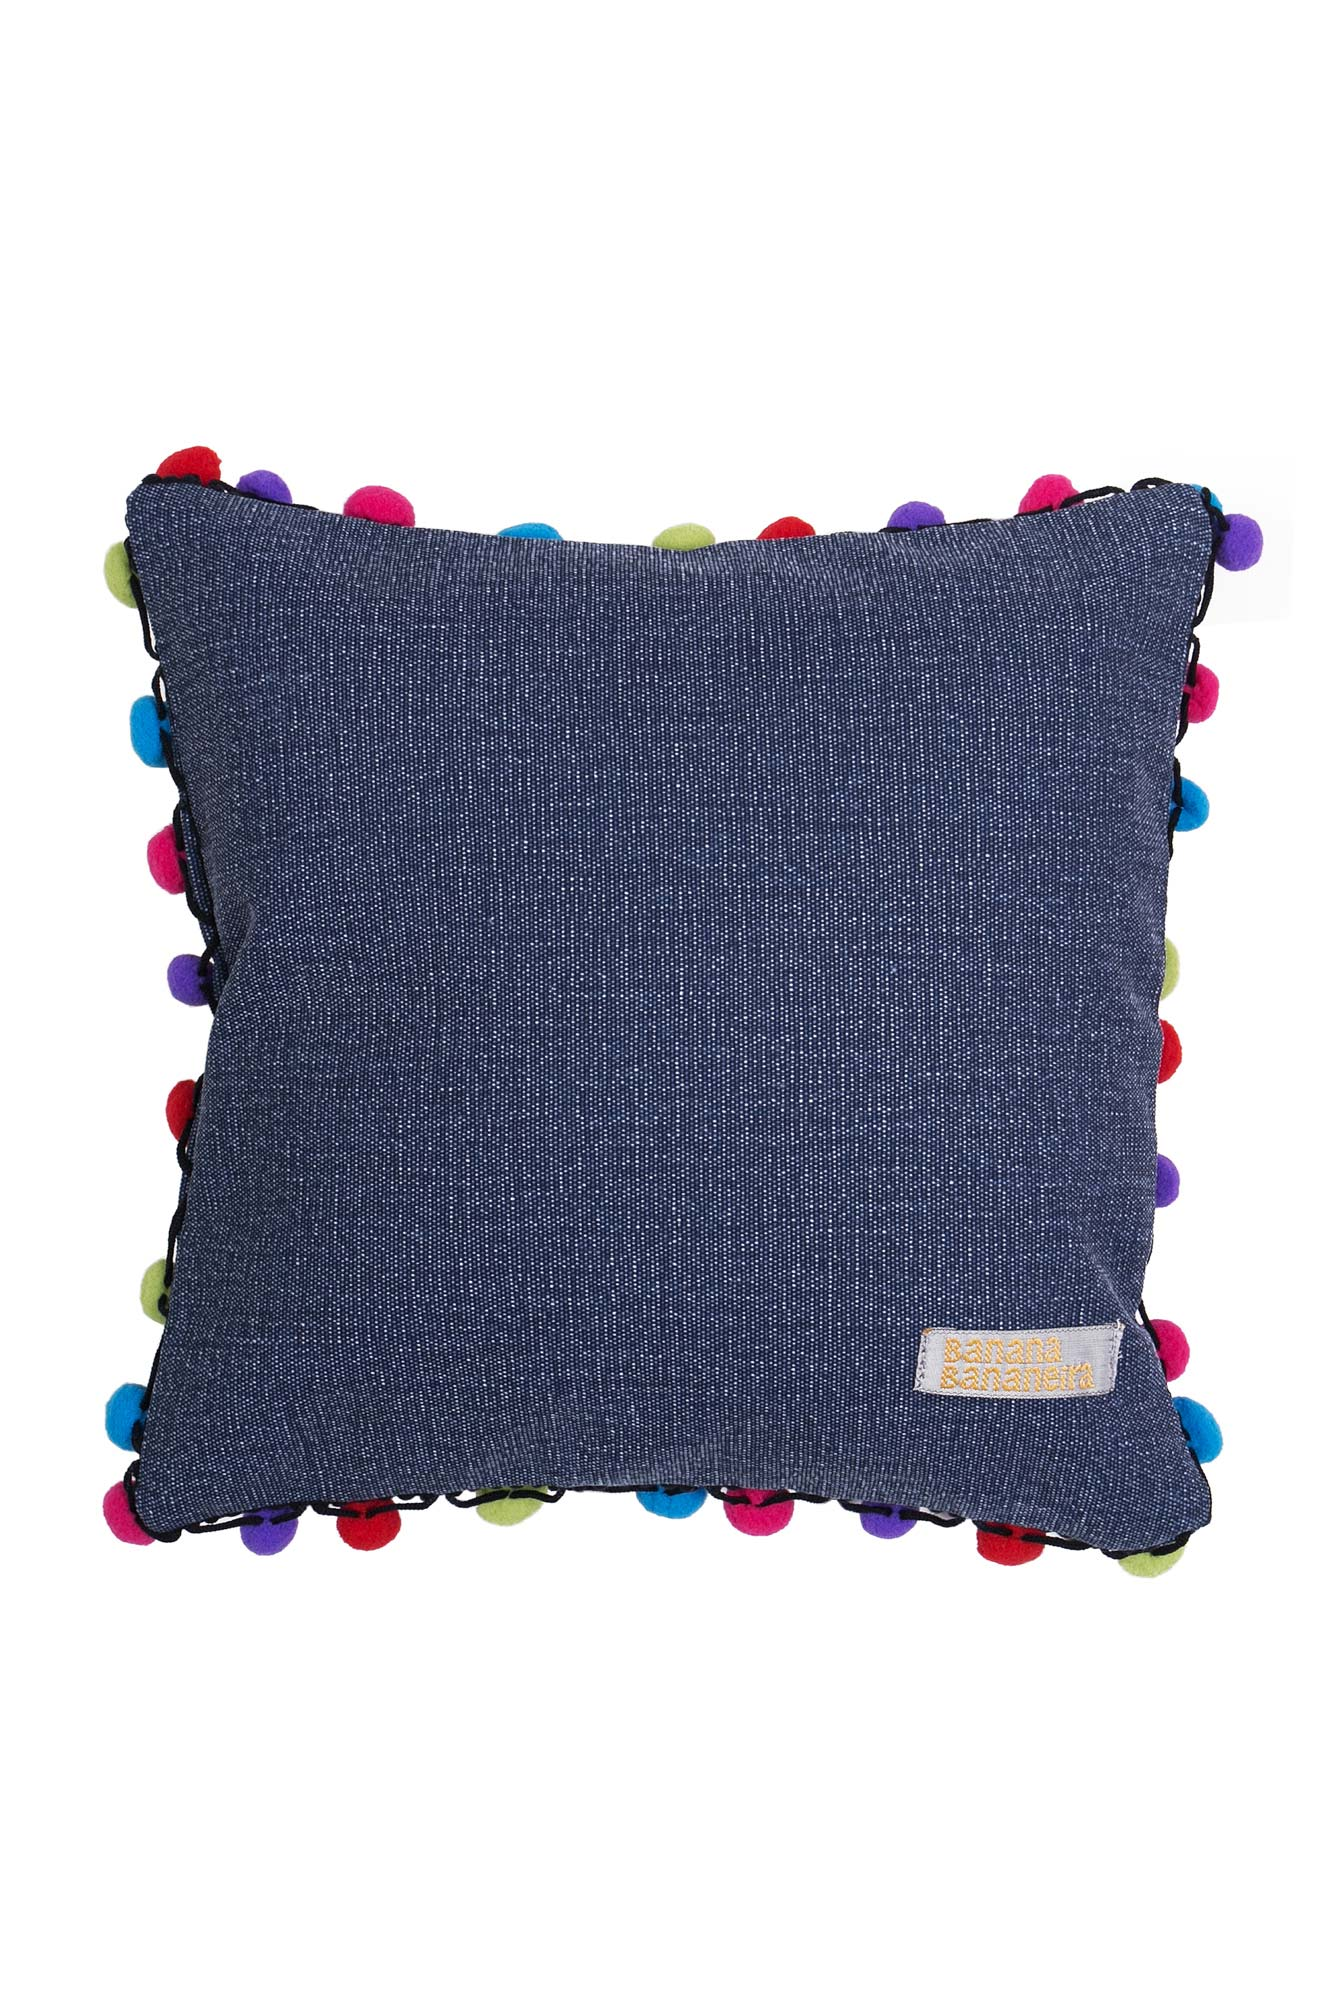 Almofada pompom 25 cm x 25 cm jeans azul